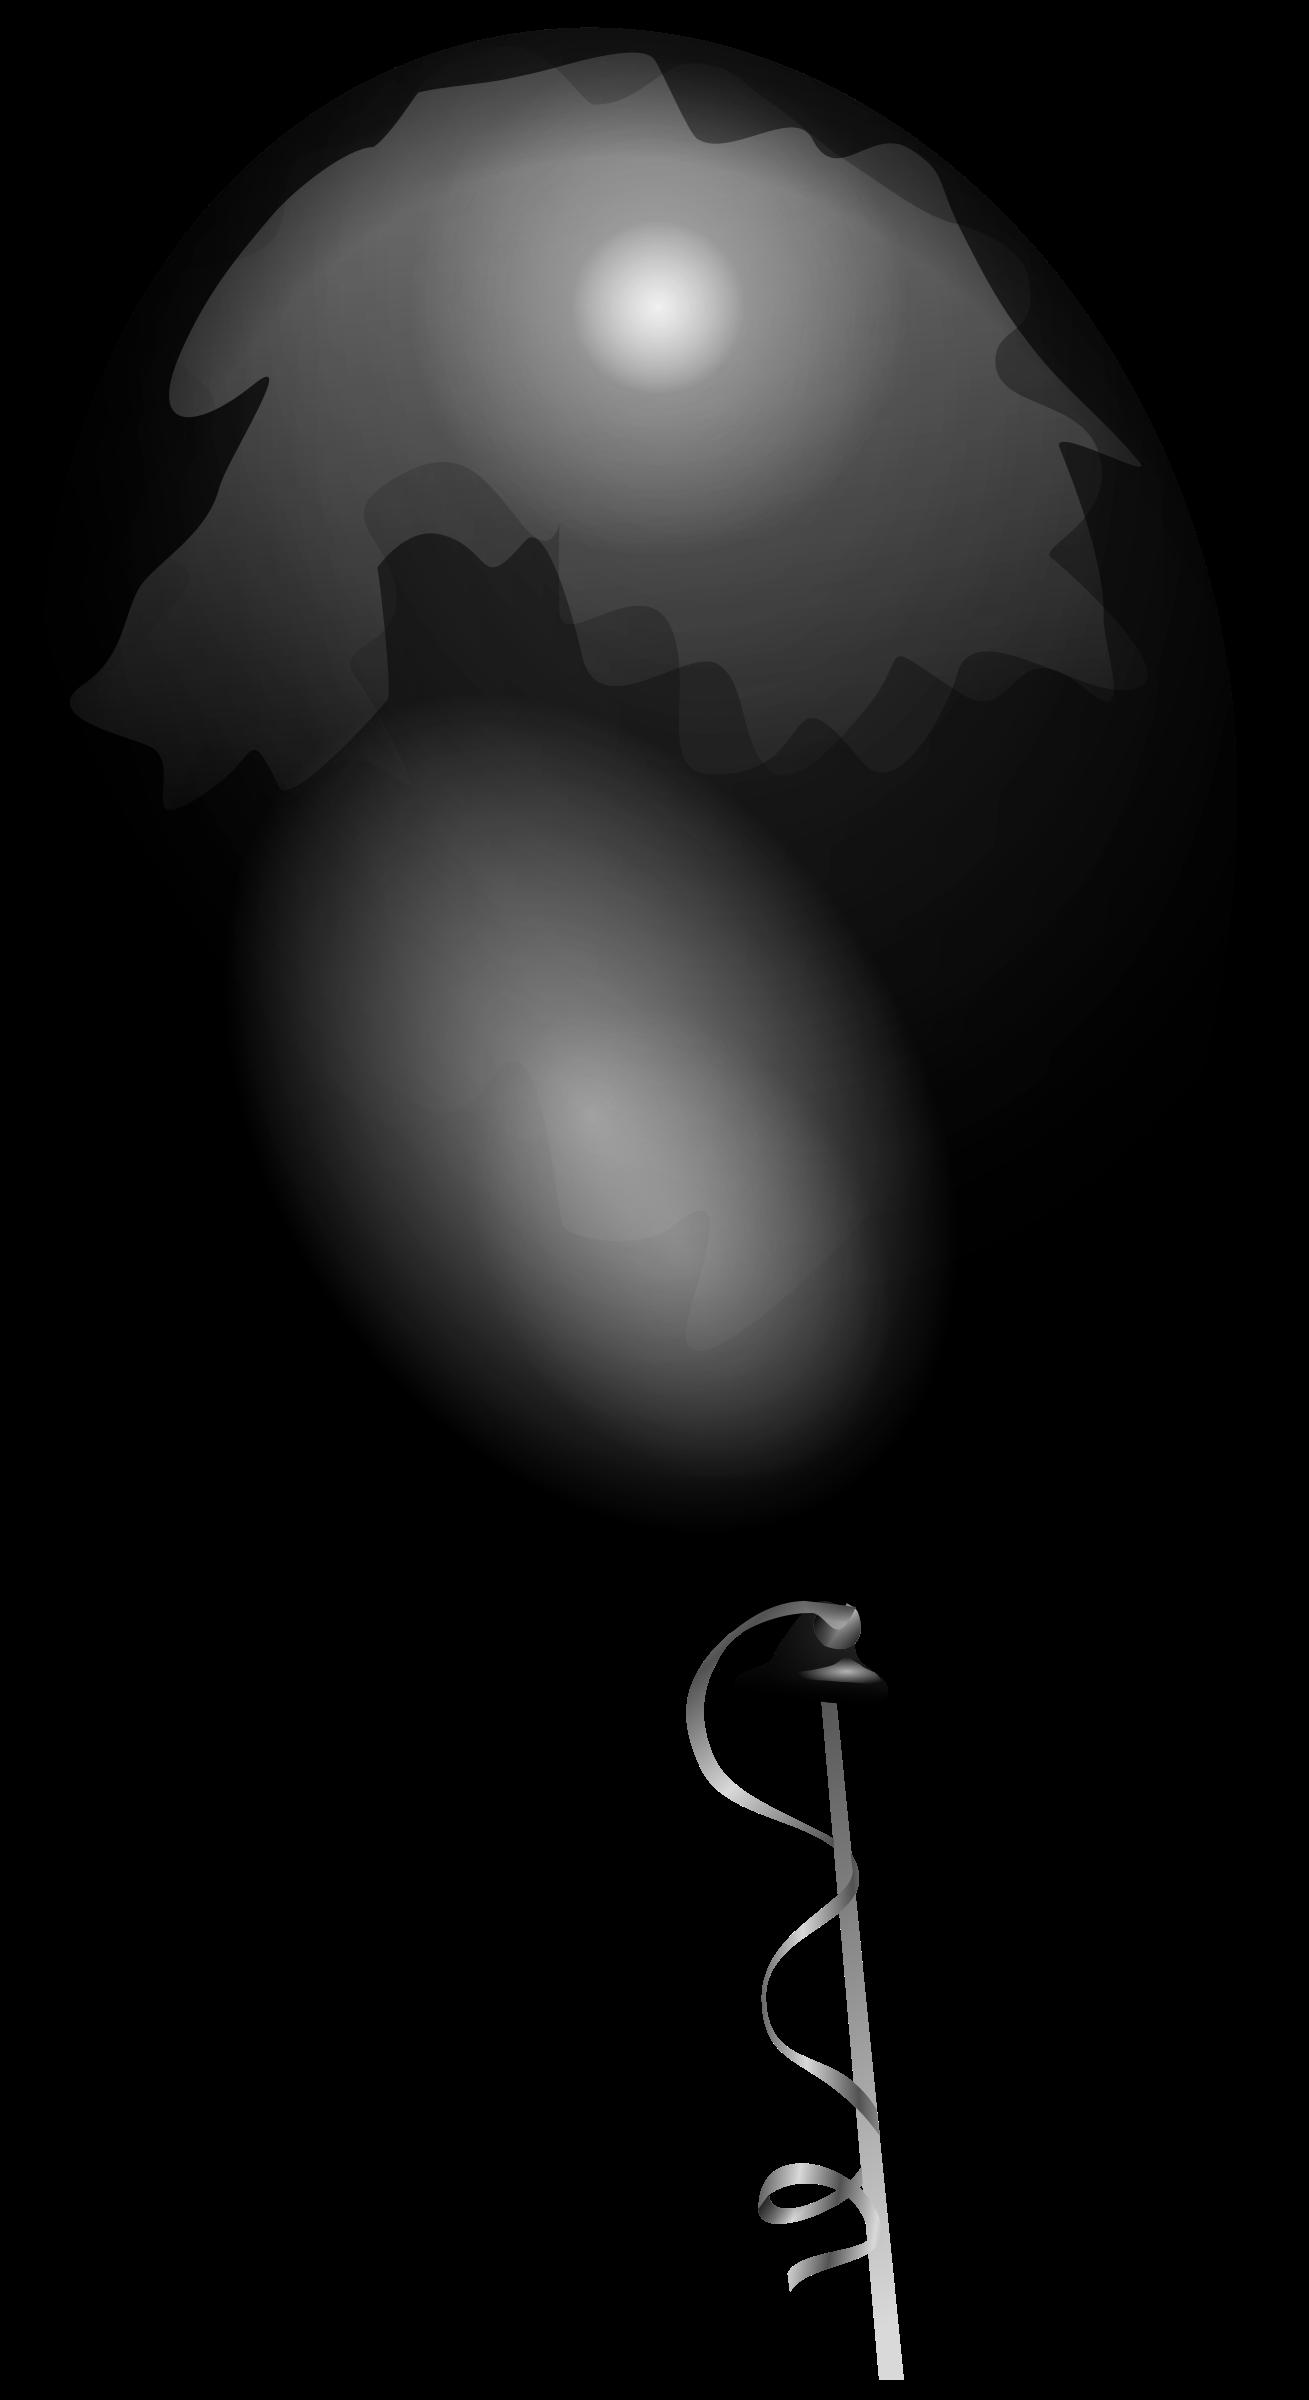 Balloons grey